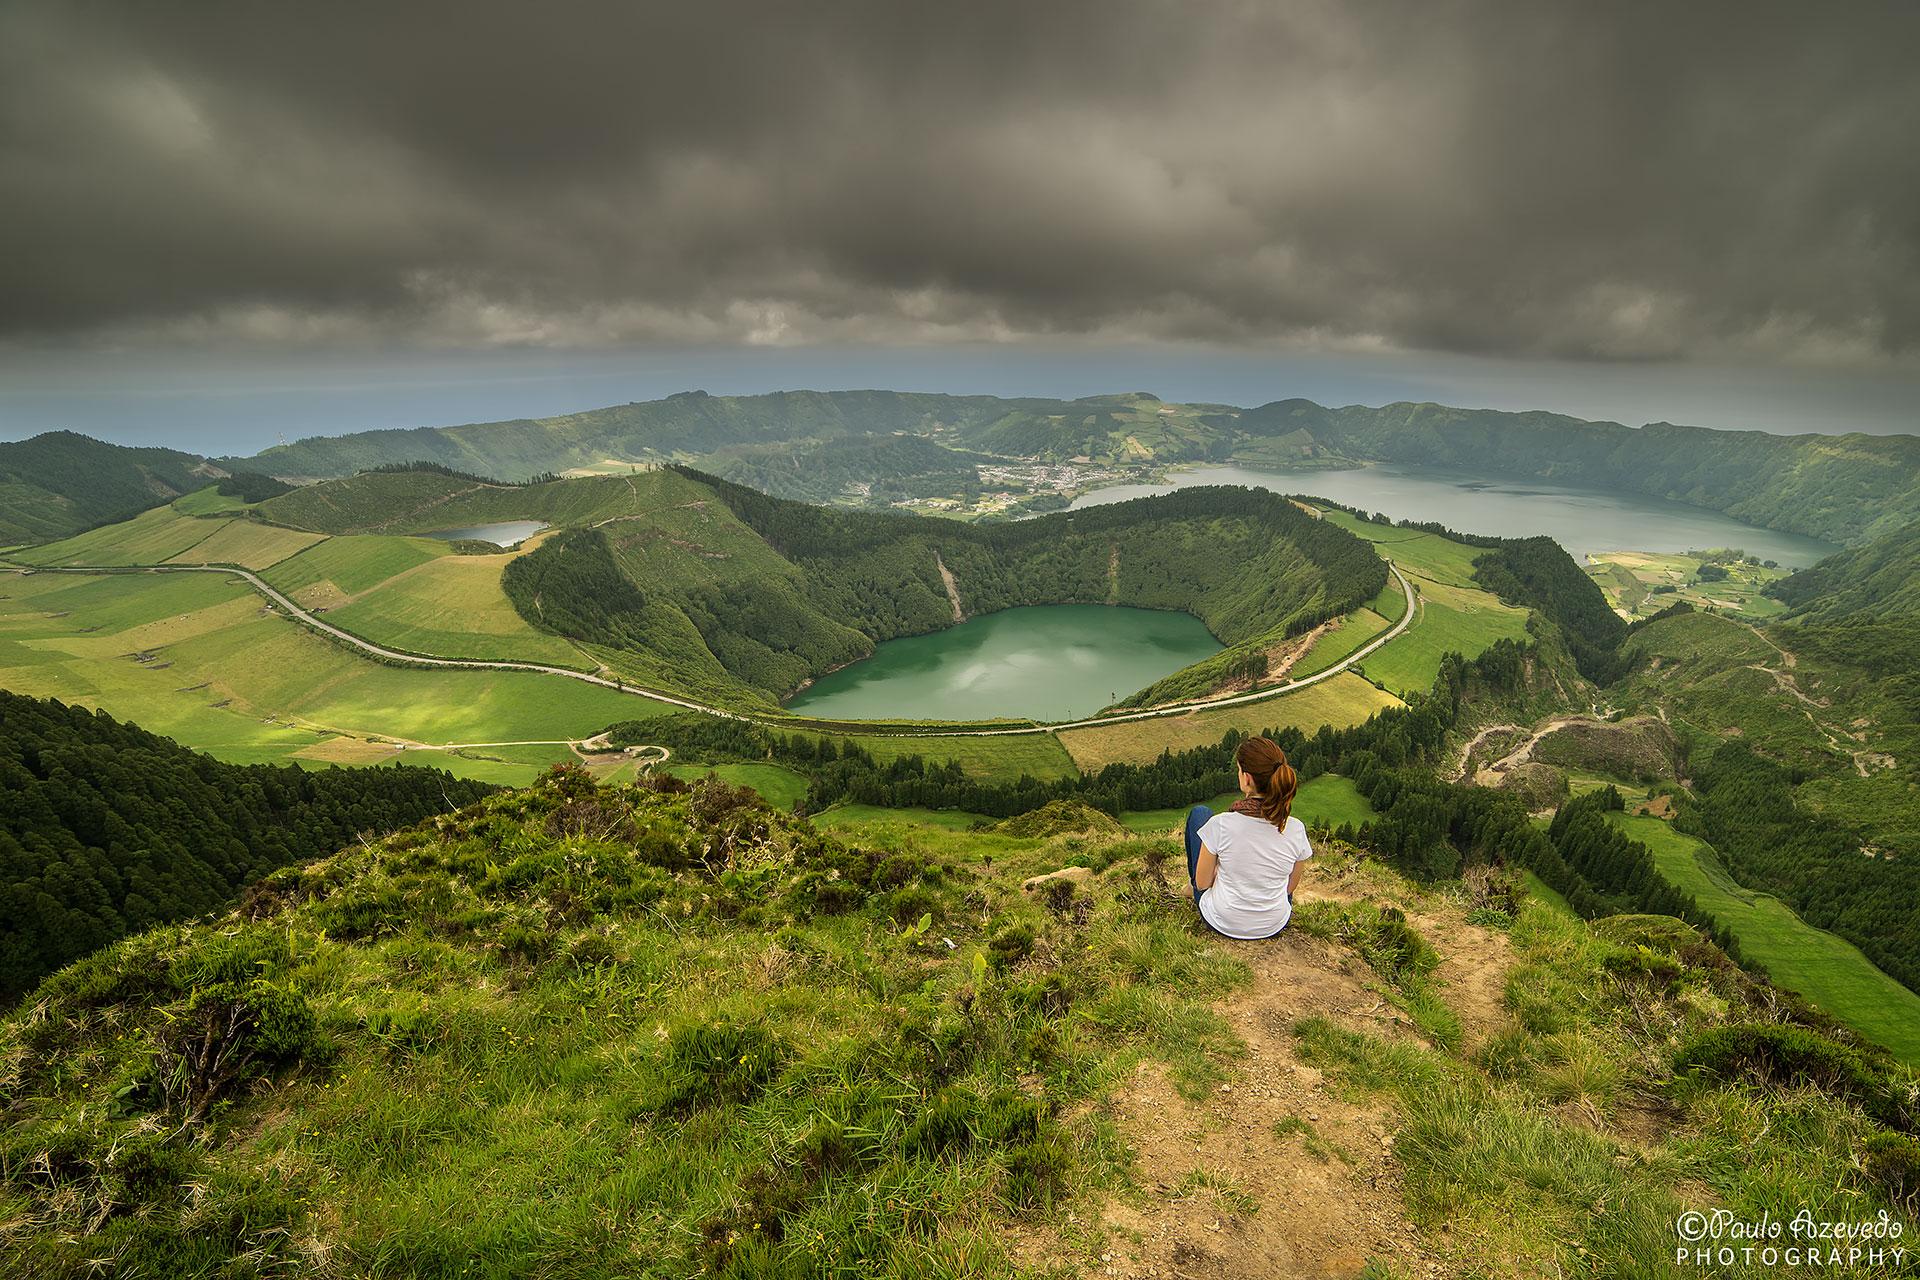 Canário's Viewpoint, Portugal